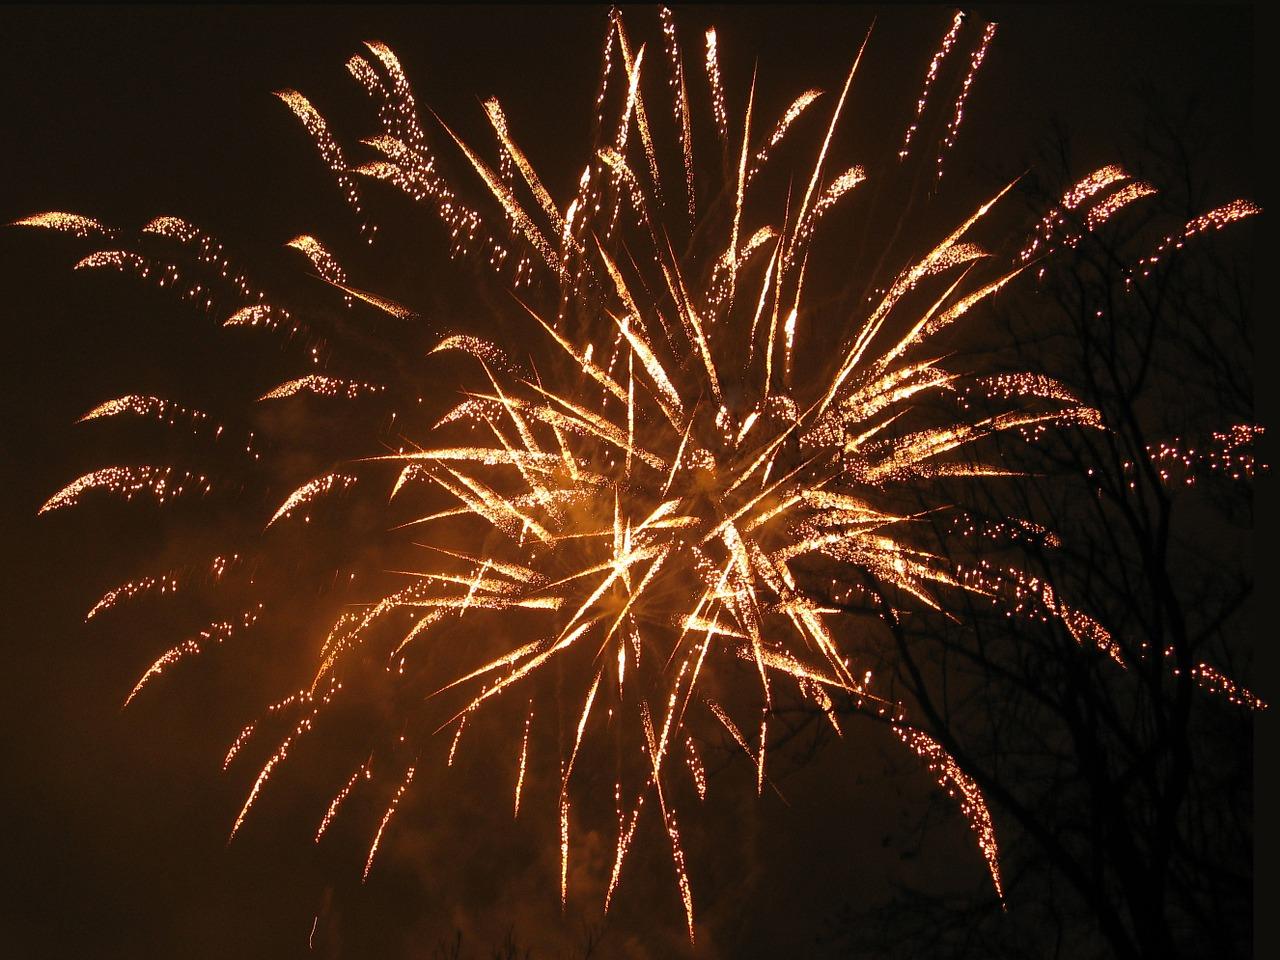 fireworks-661654_1280.jpg